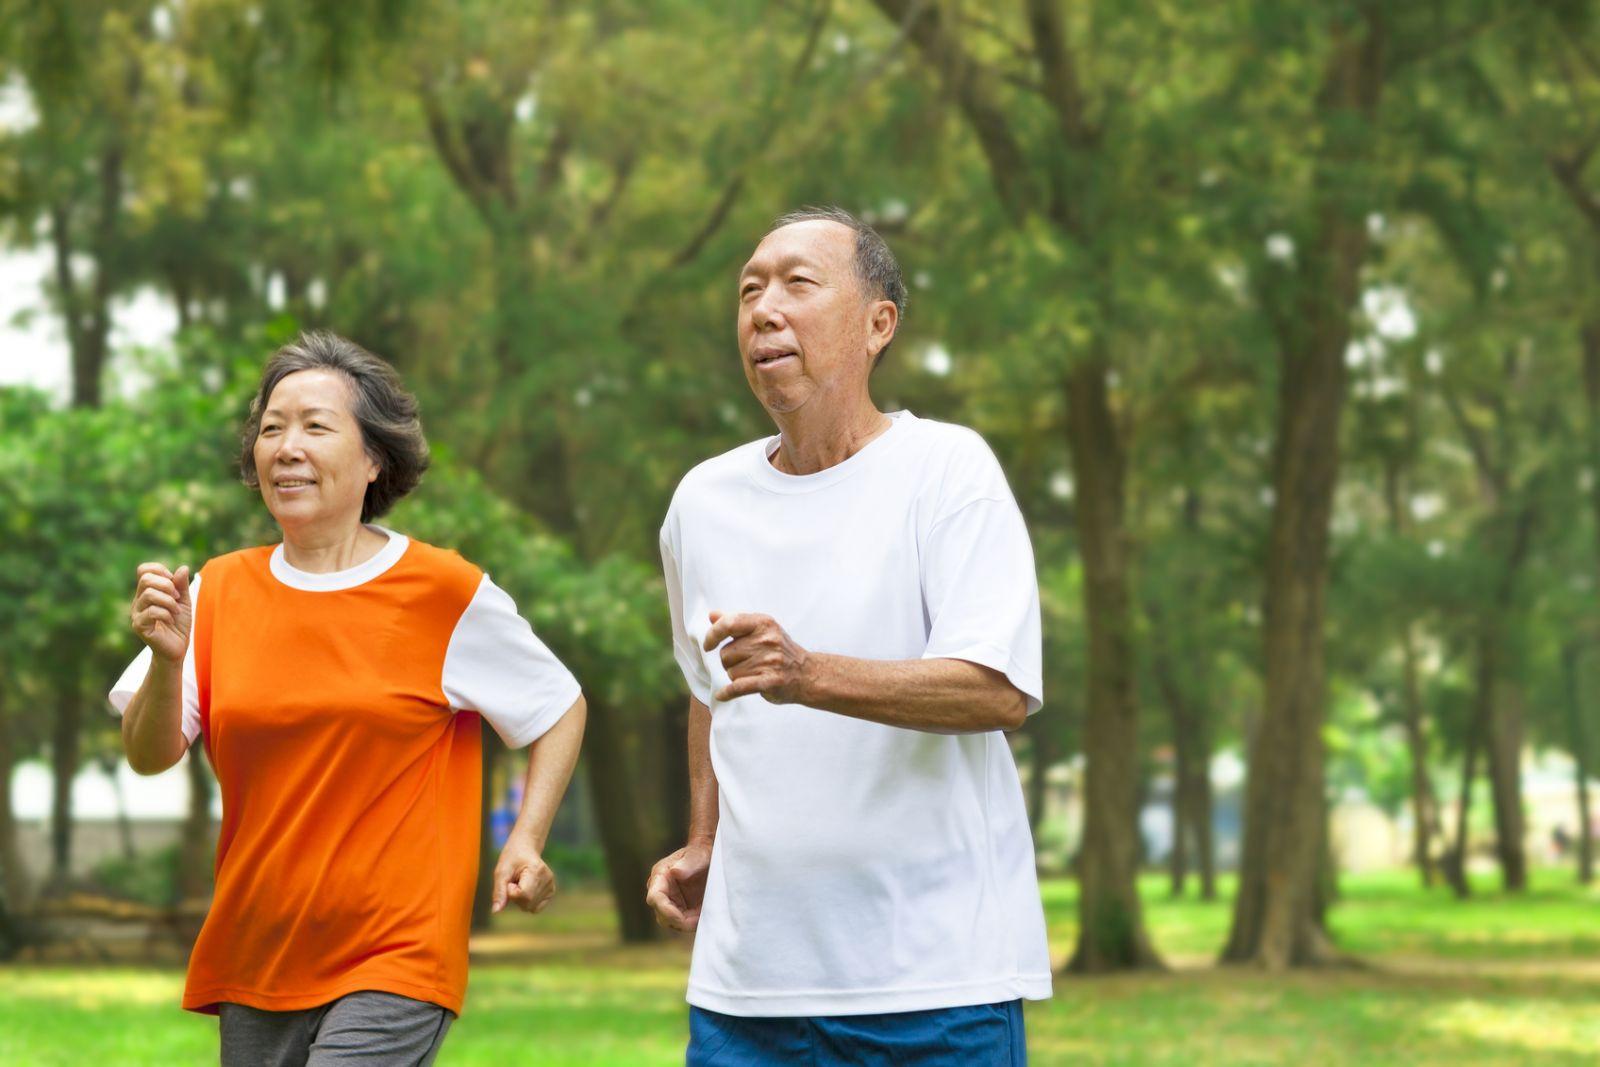 walking brain boost exercising run